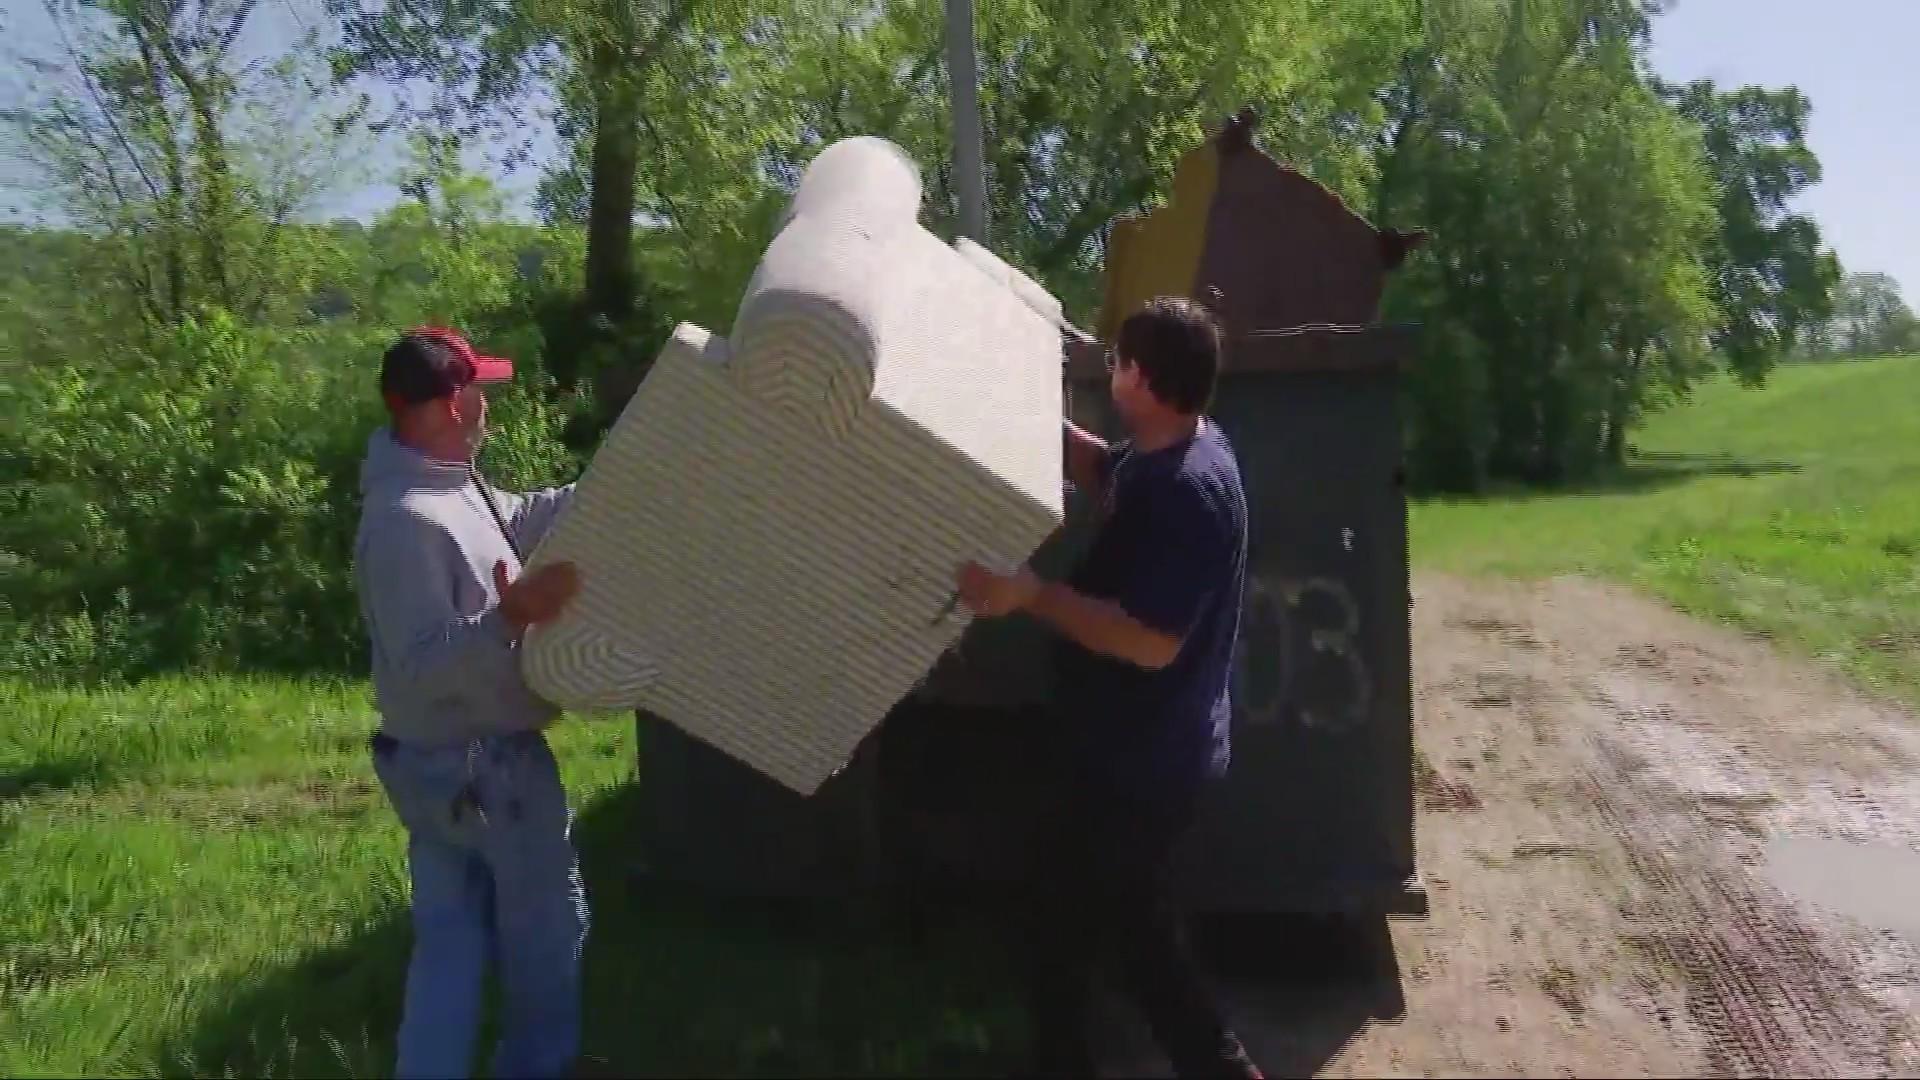 Ironton kicks off 'Clean Up Week,' dumpsite available